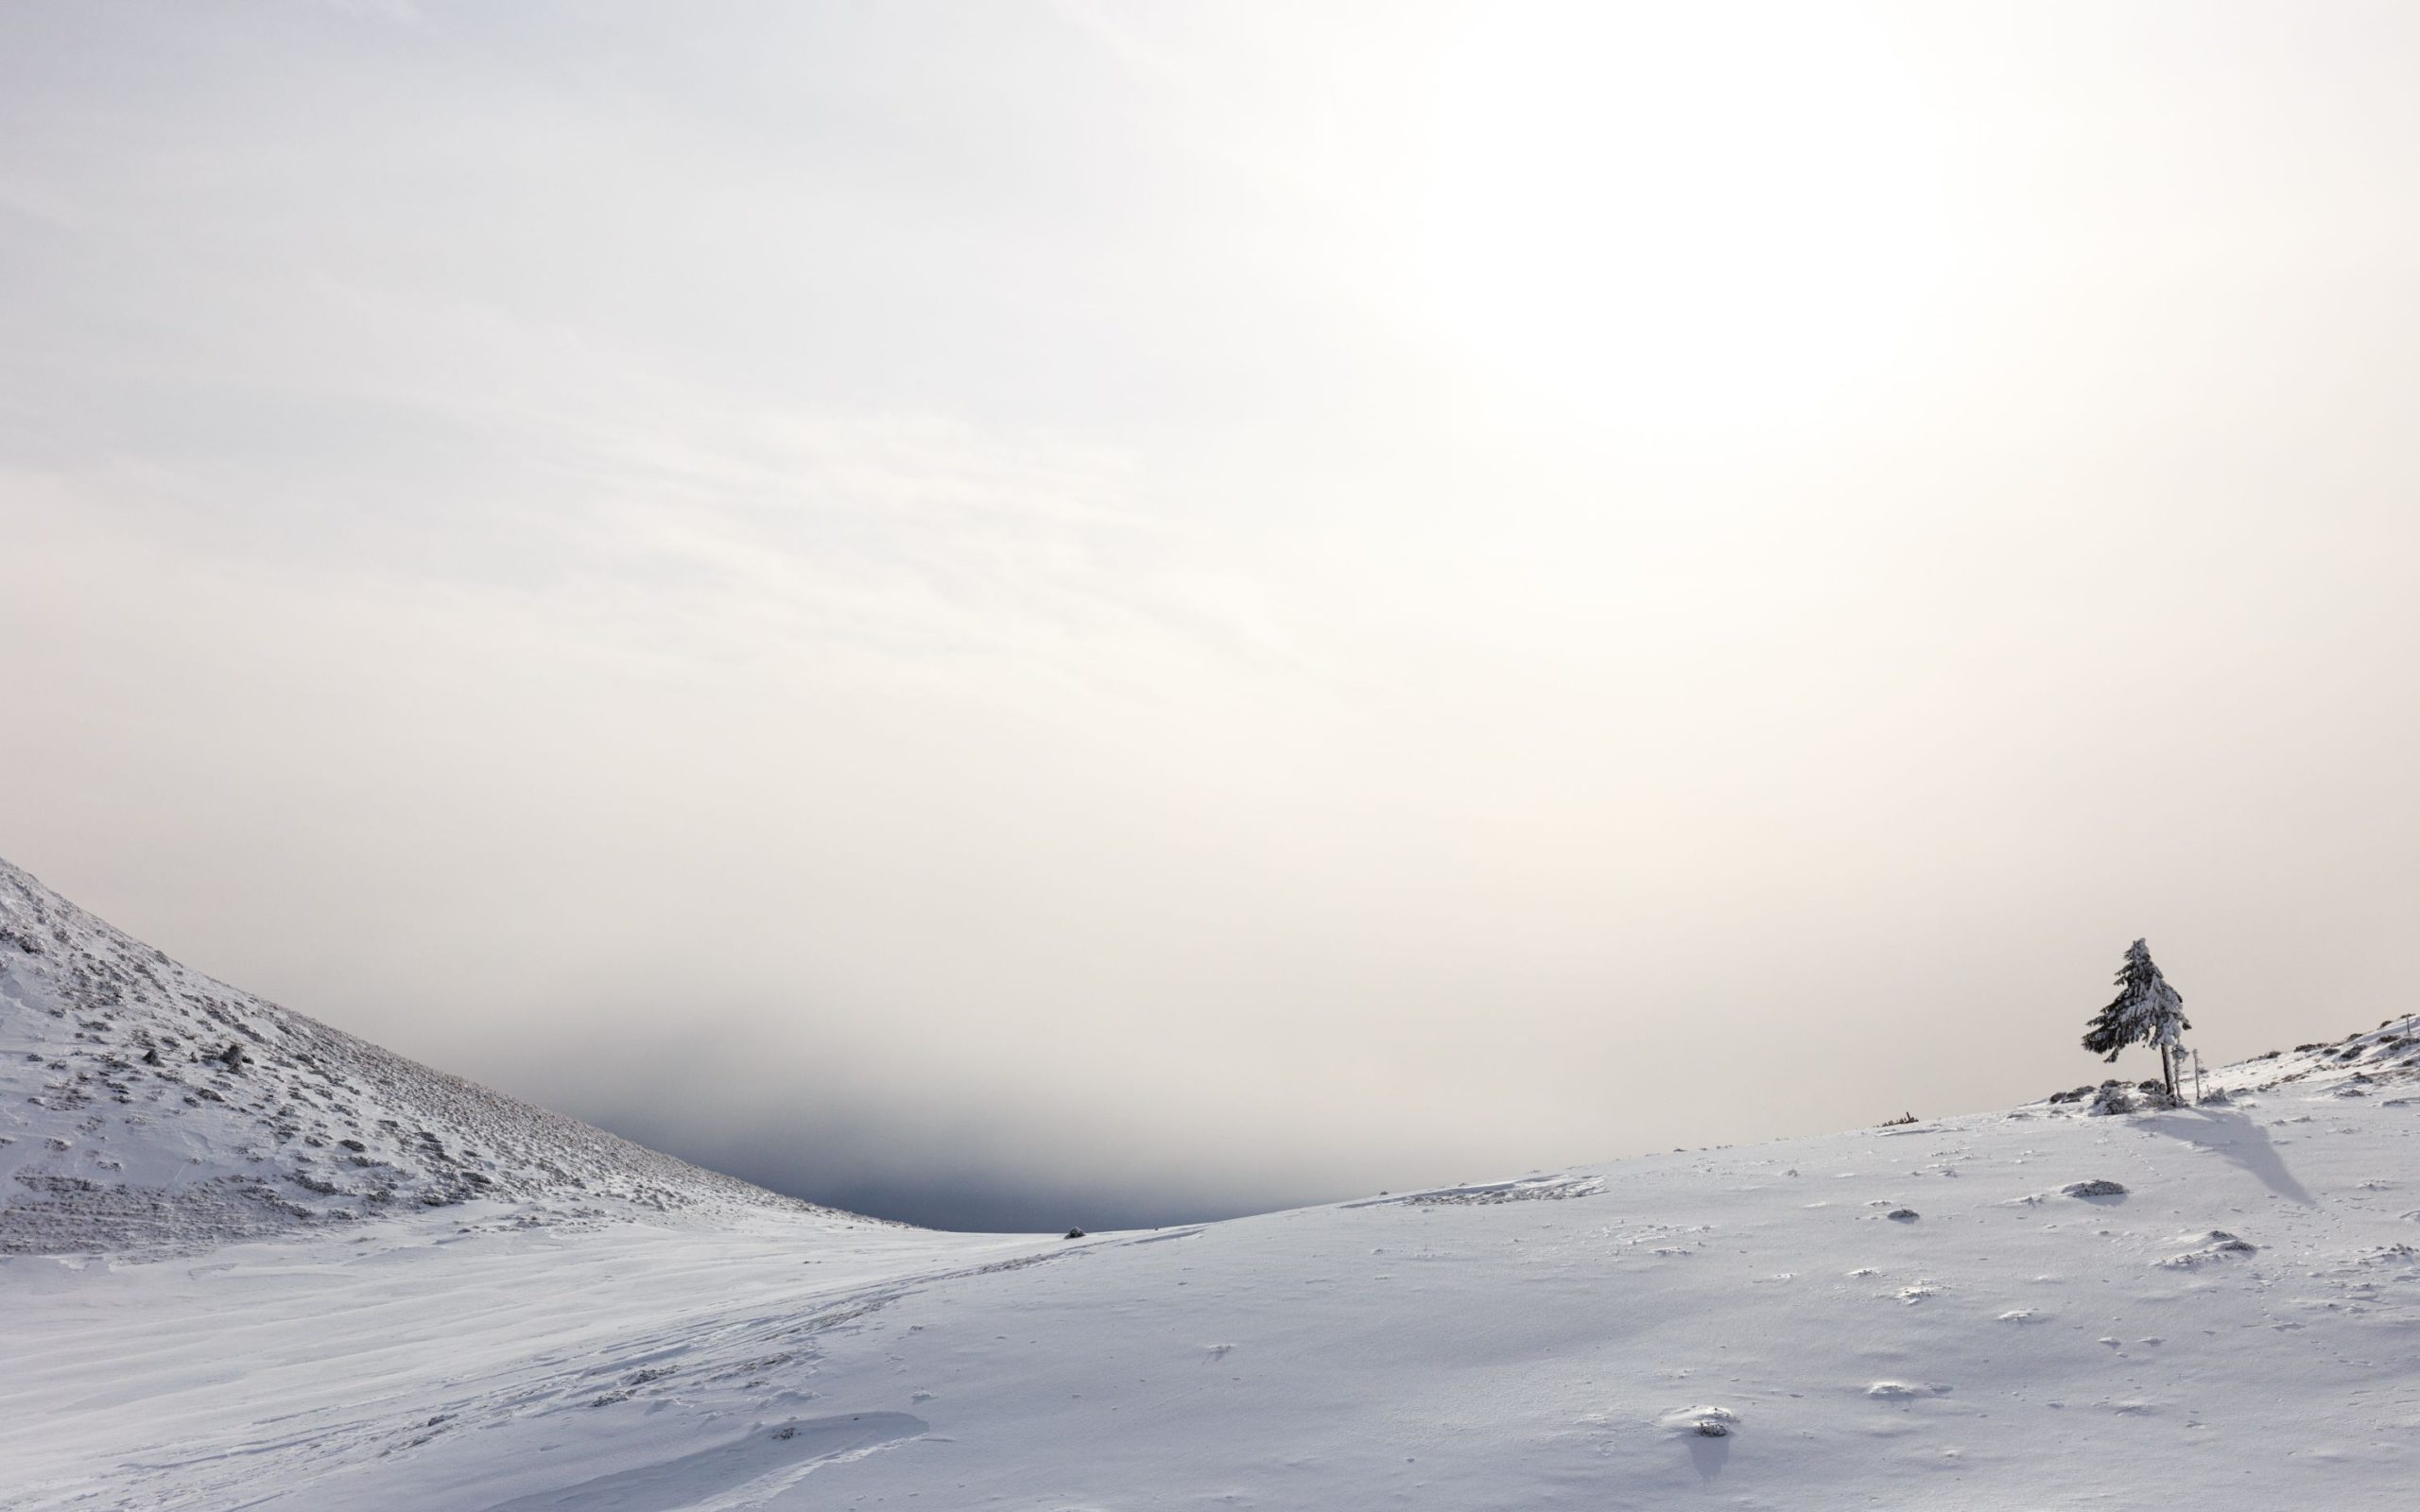 Veil of winter